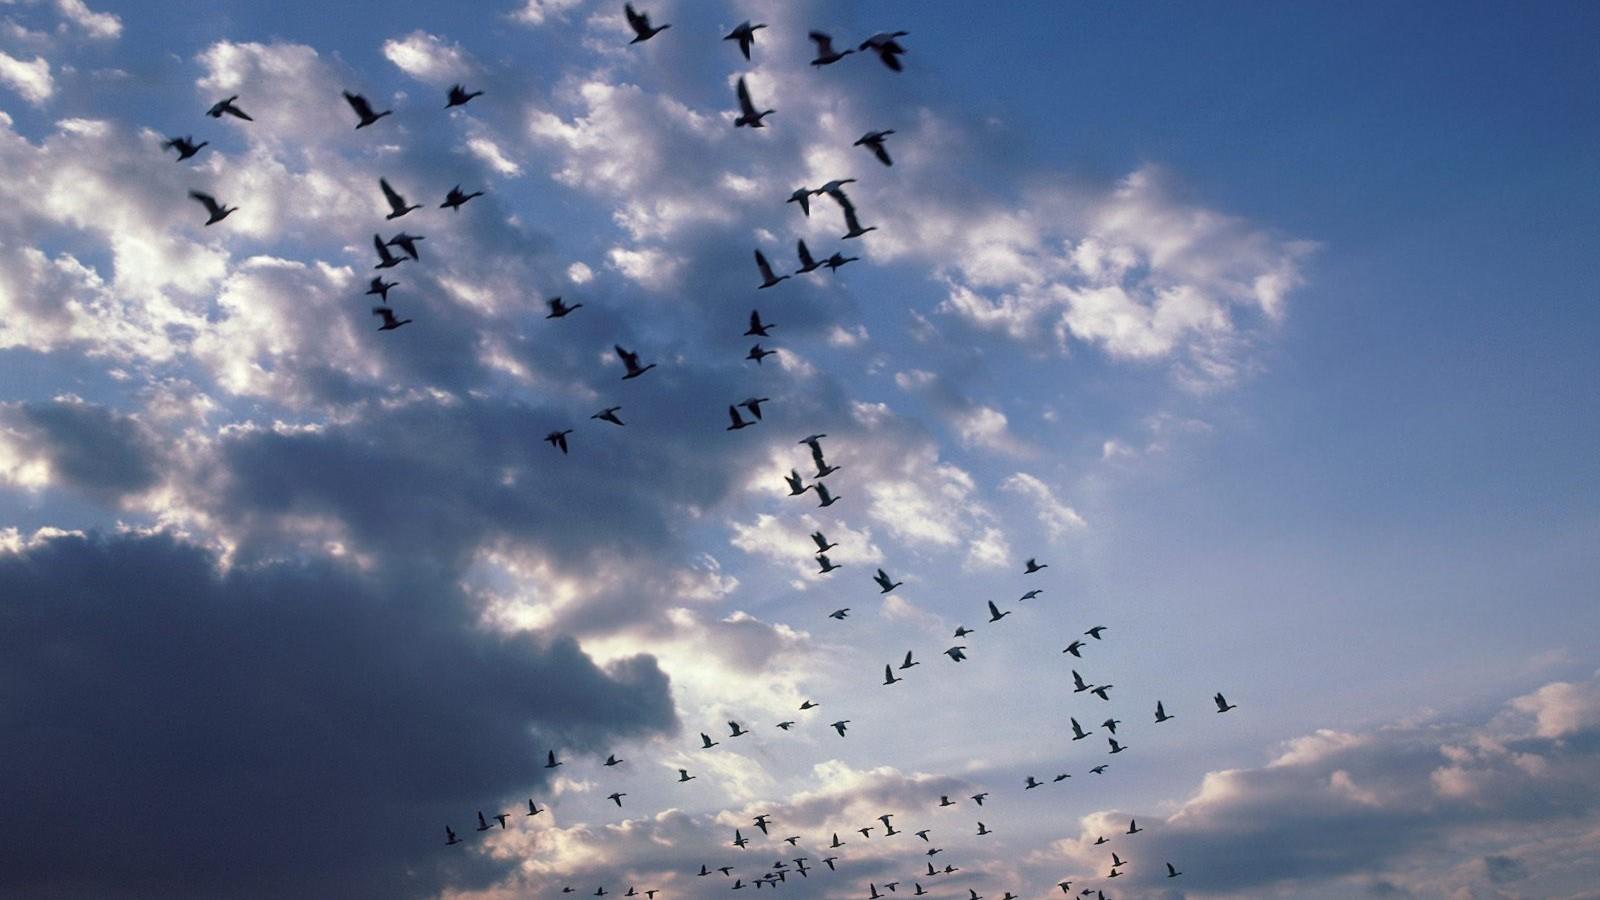 Birds flying in the sky - photo#18